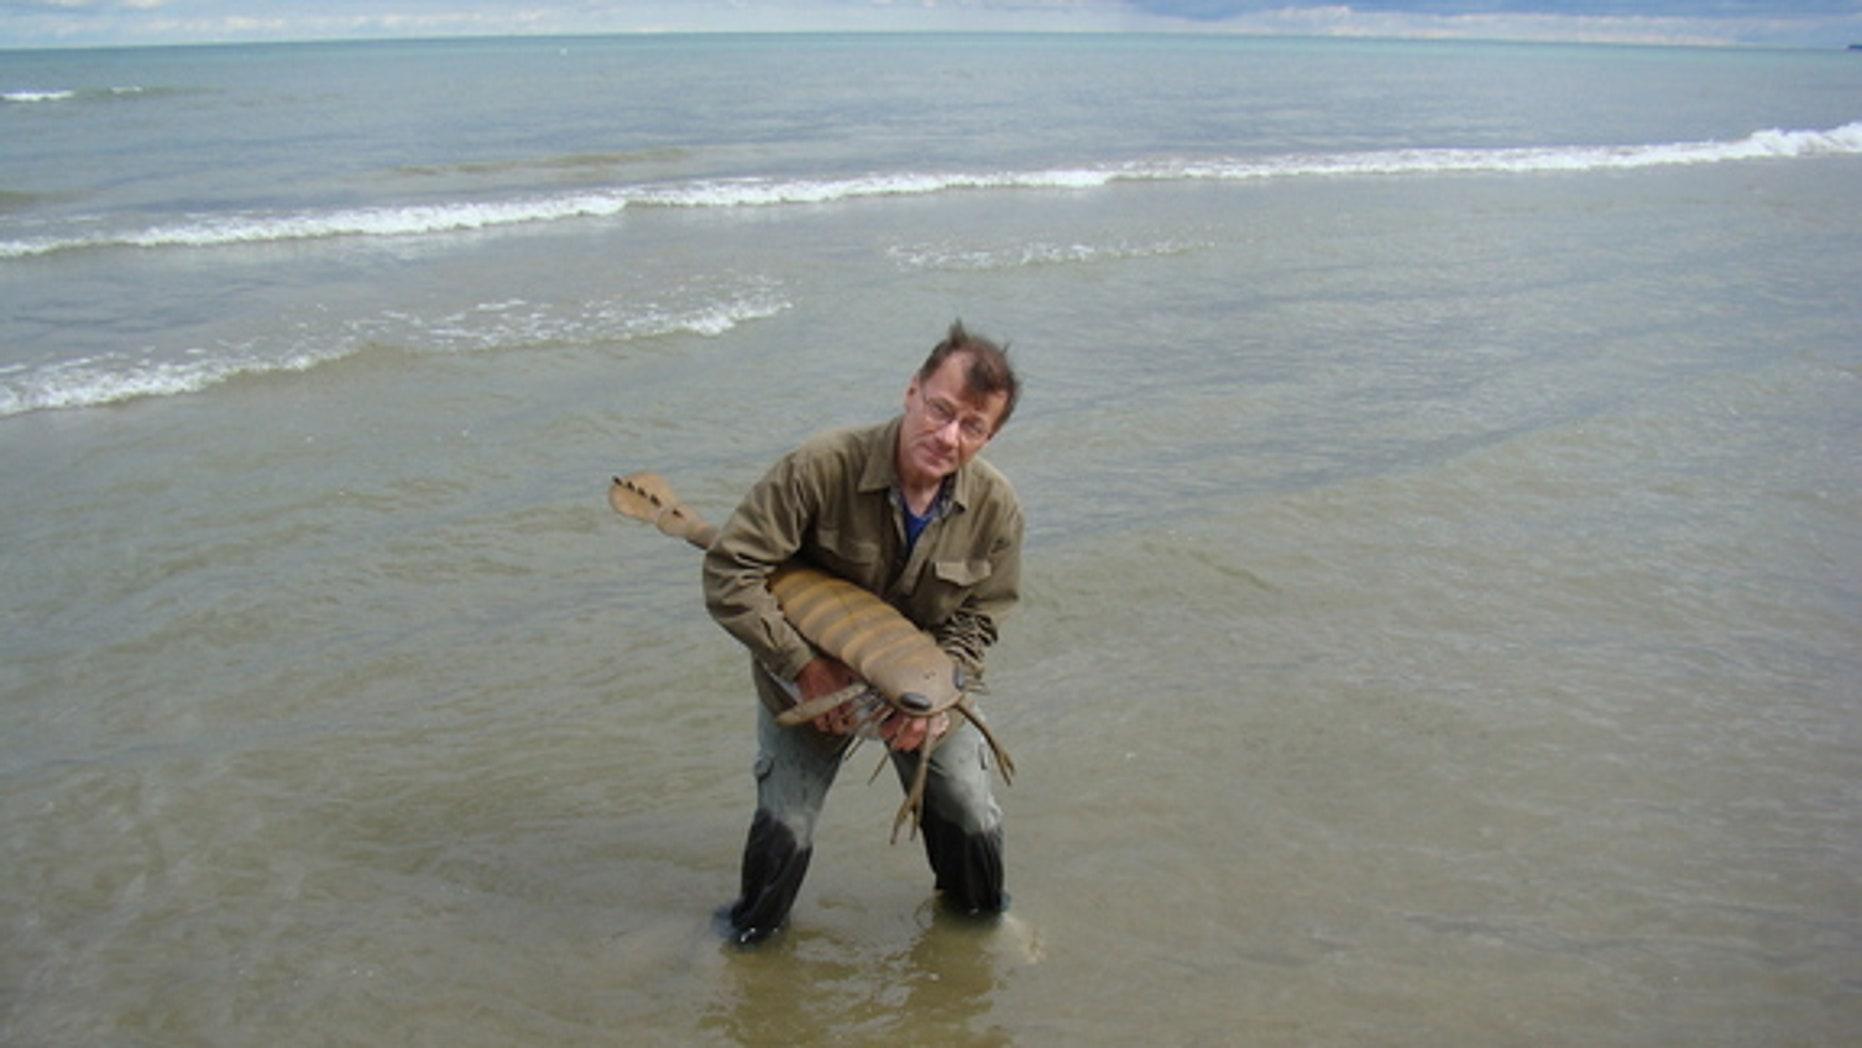 Sam Ciurca, who collected the sea scorpion specimens, with a life size model of one called Acutiramus.